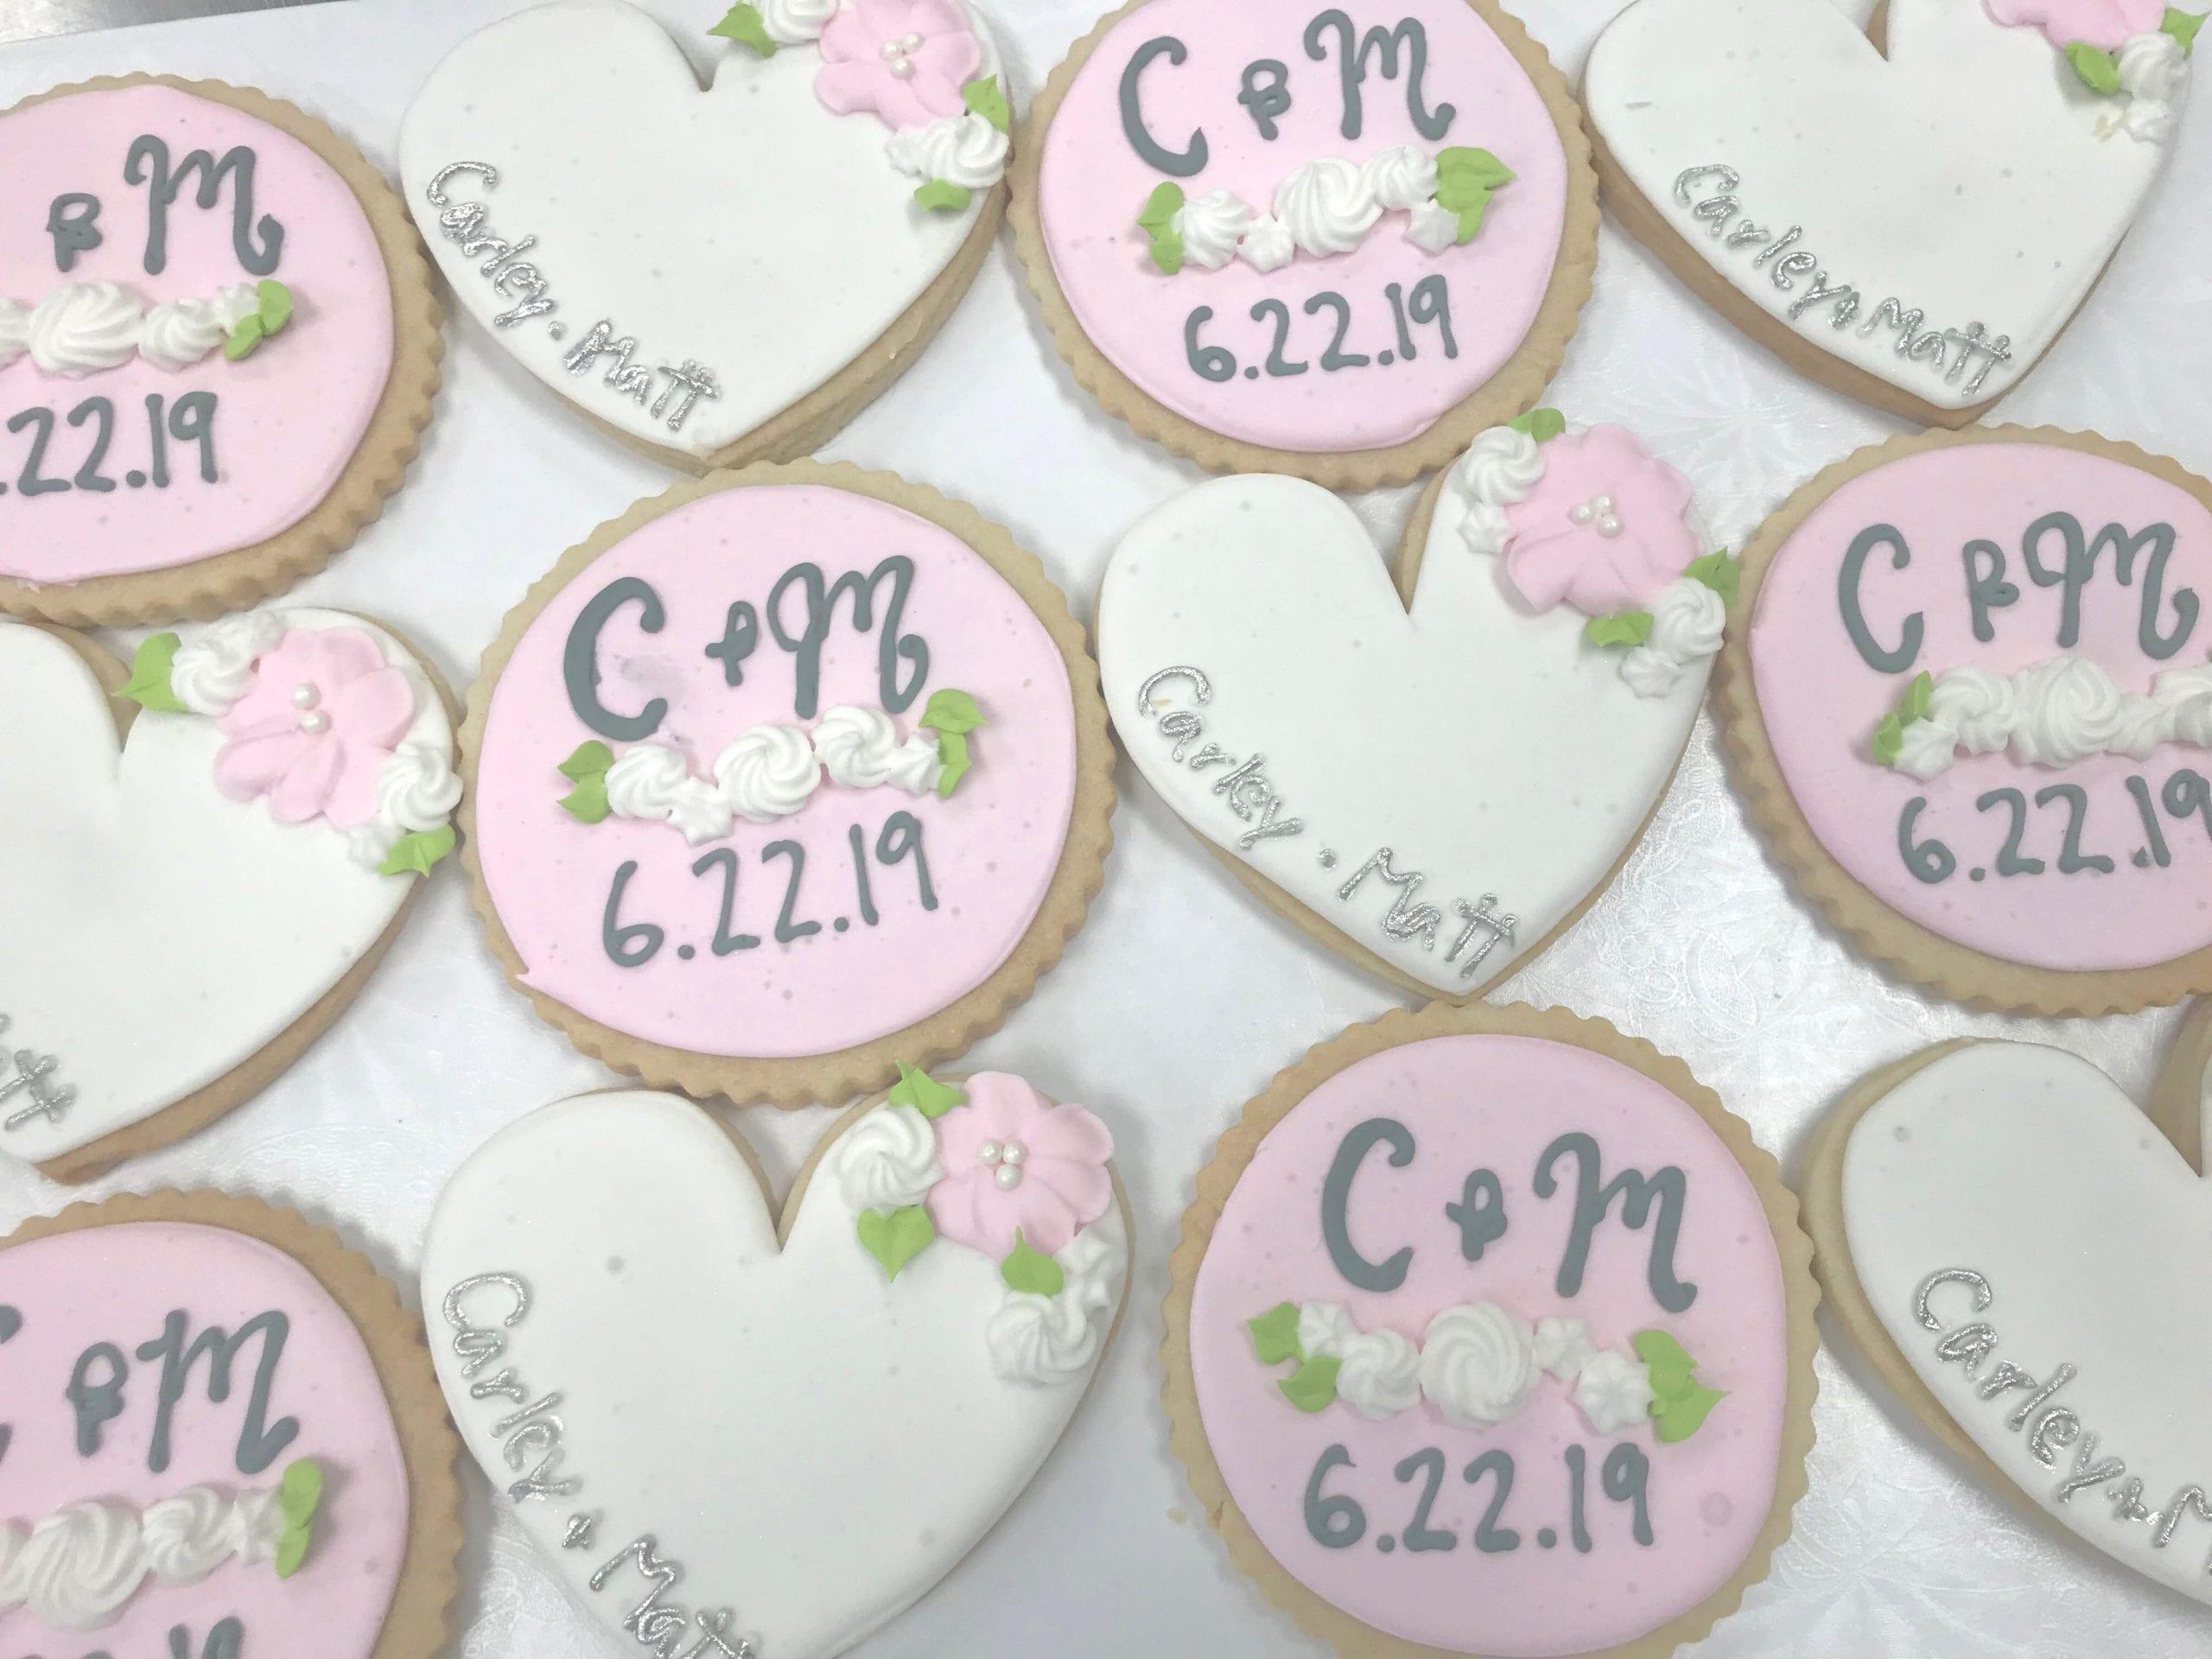 Blush, White and Silver Monogram Wedding Cookies   3 Sweet Girls Cakery